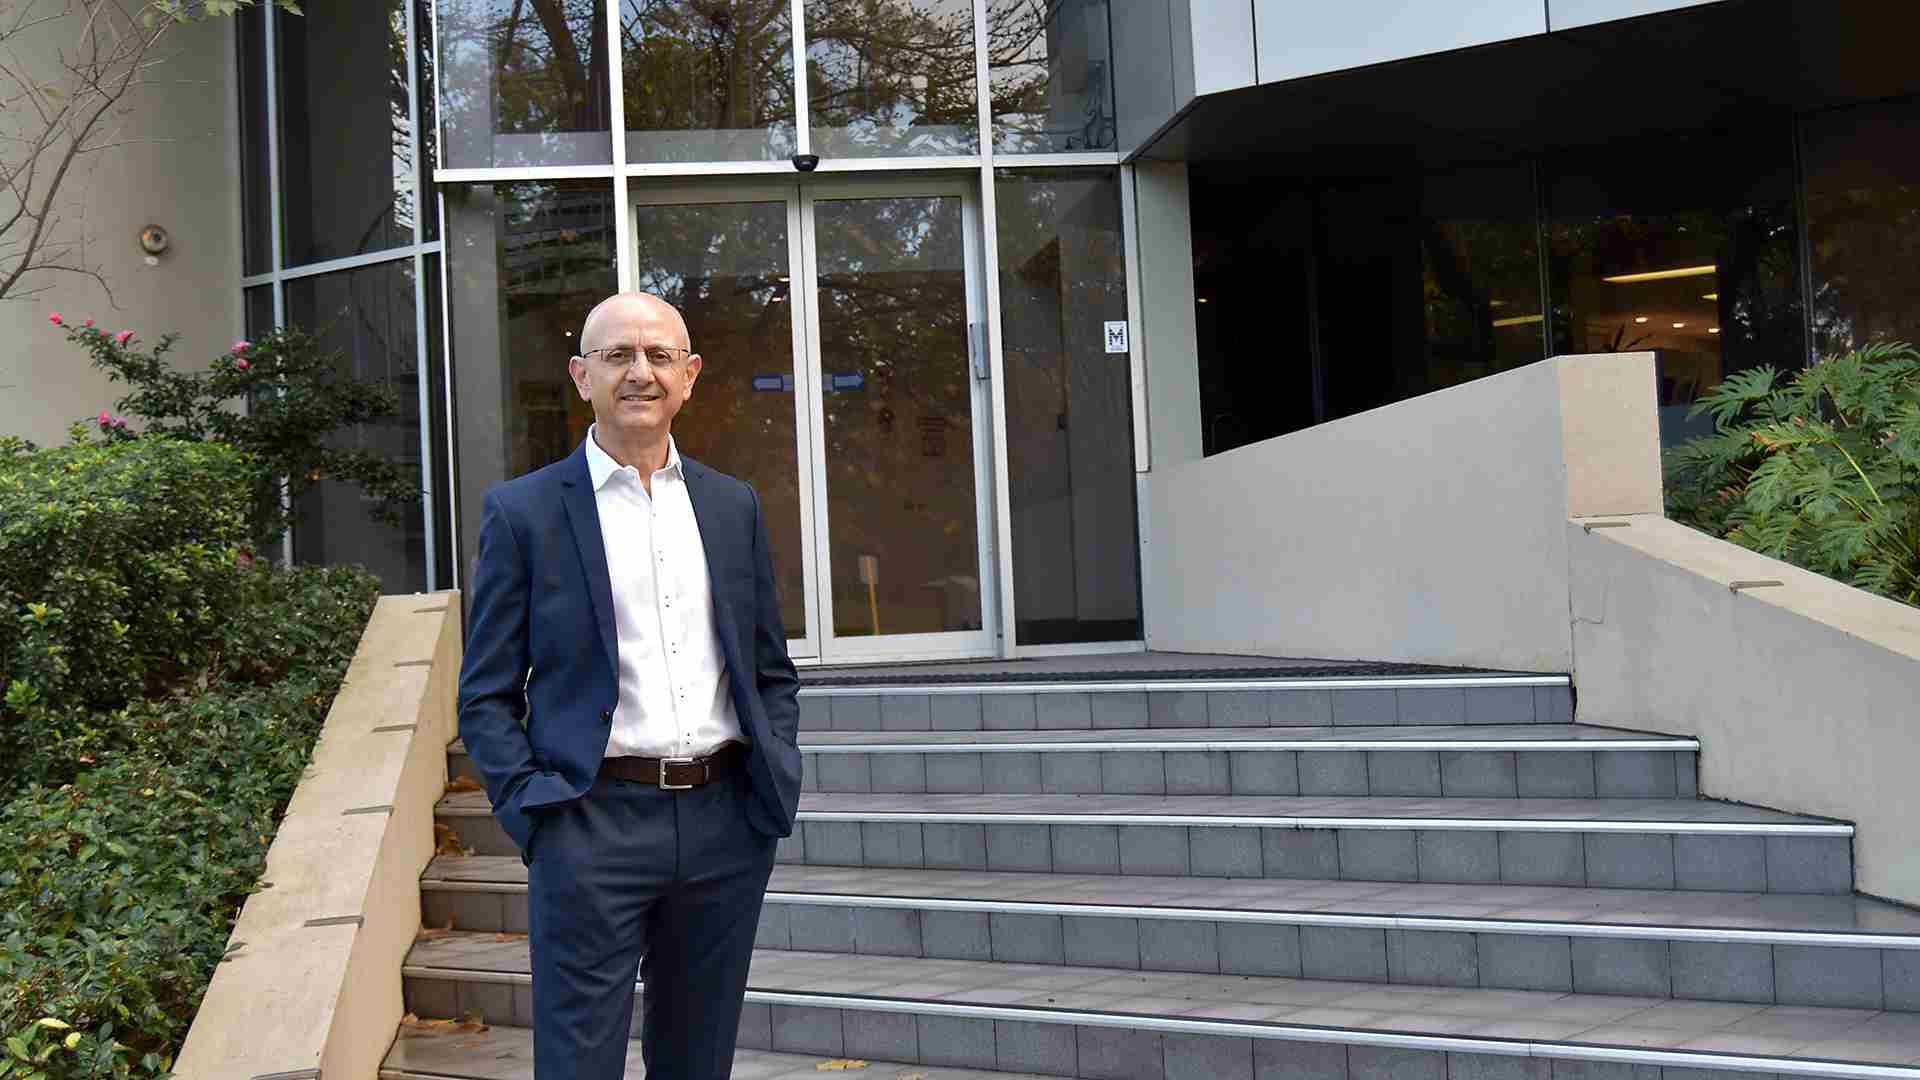 Investor in Focus - John Monaco